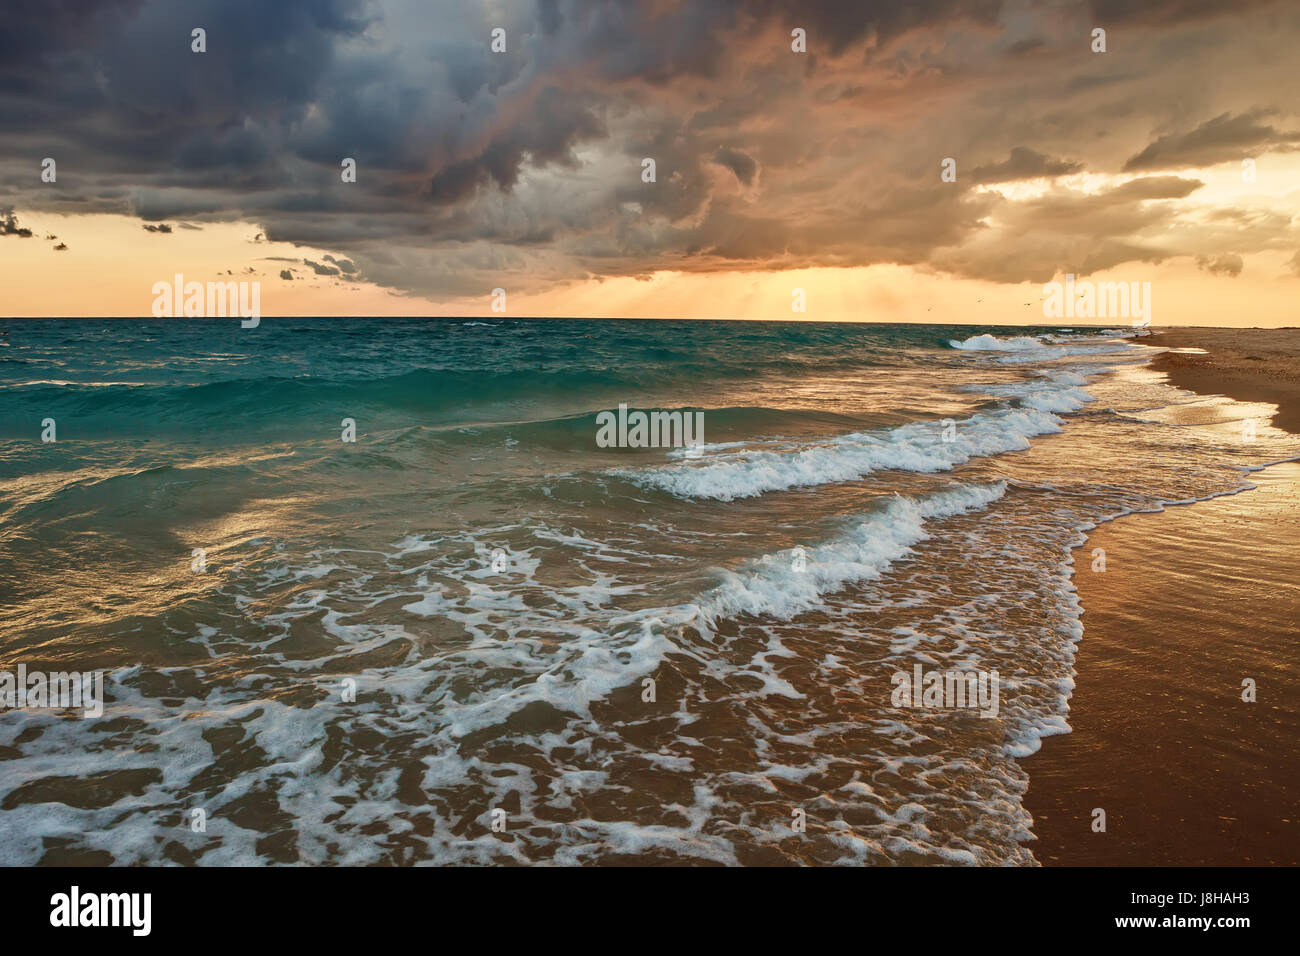 Fiery orange sunset sky. Beautiful sky.Beautiful flaming orange sunset with dark clouds above the sea. - Stock Image